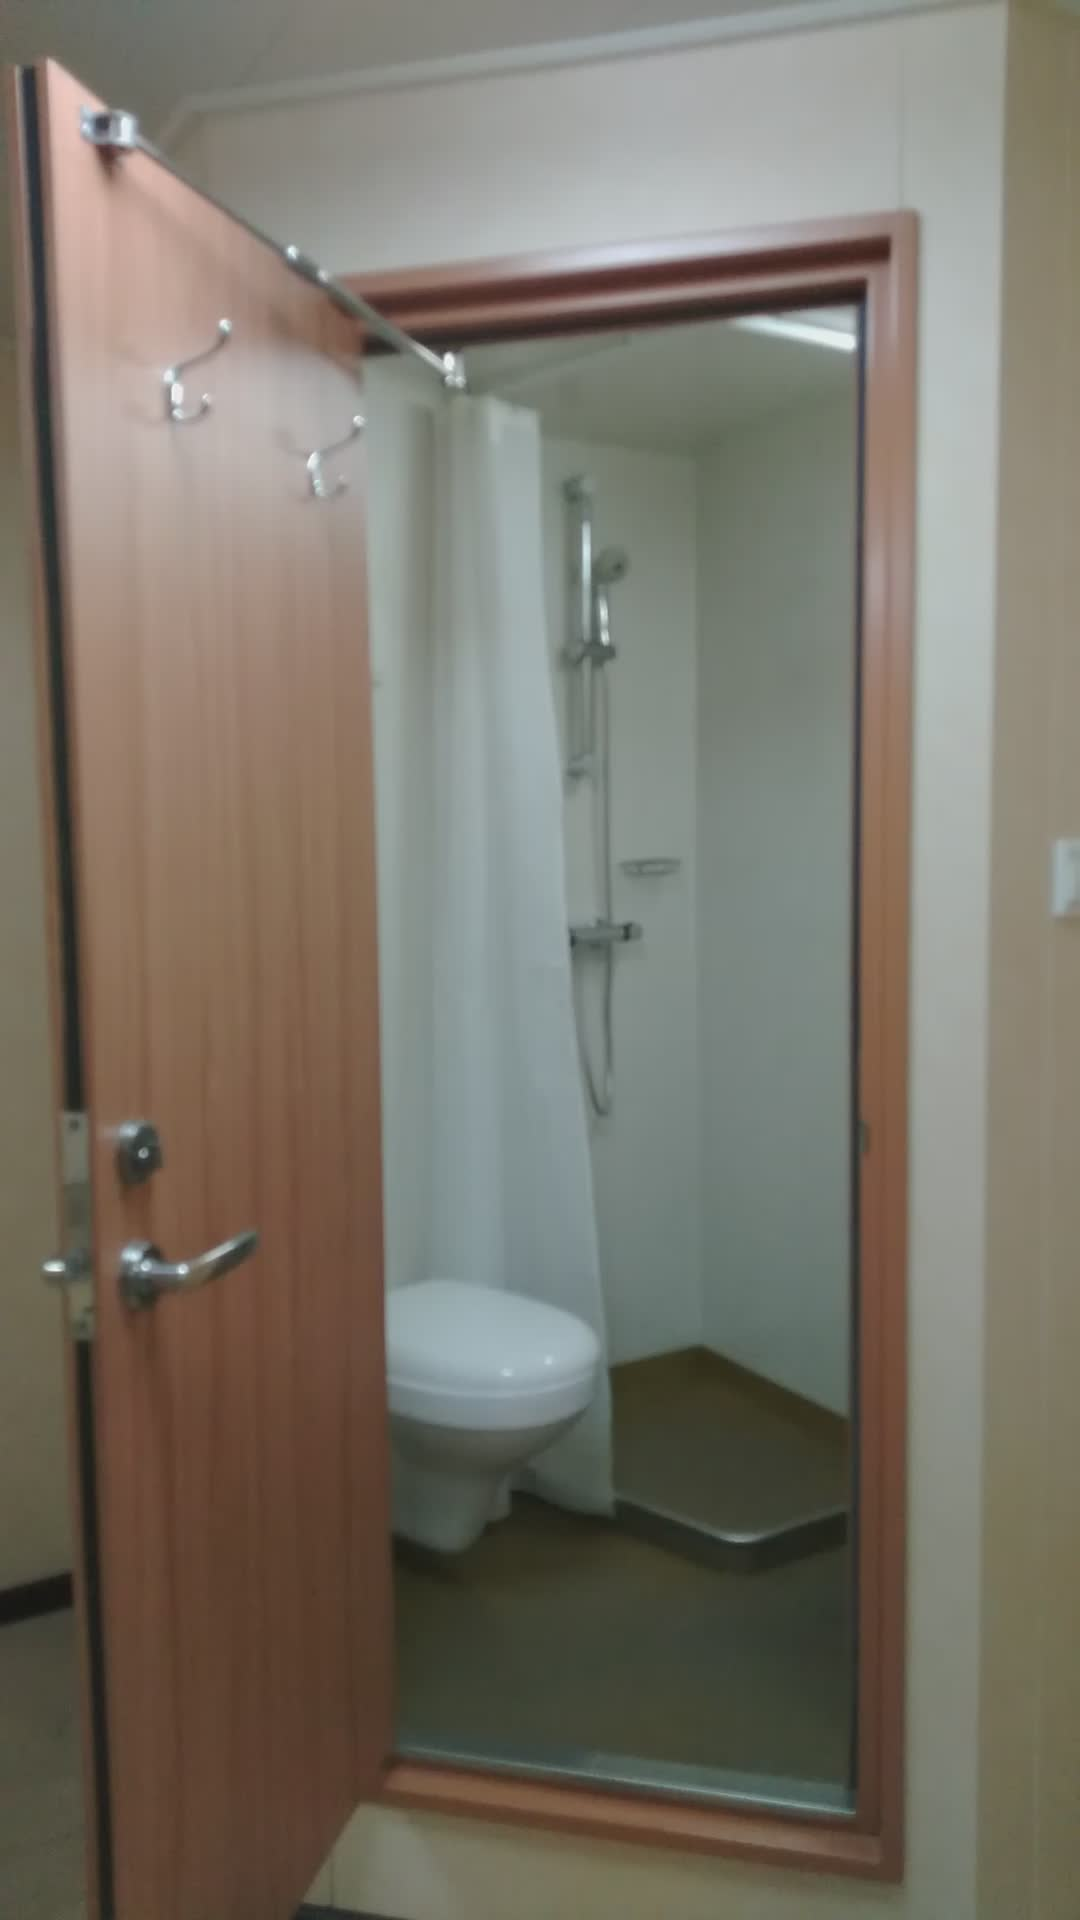 offshore Complete Modular Wet Unit Prefabricated Wet unit bathroom modules for ship interior